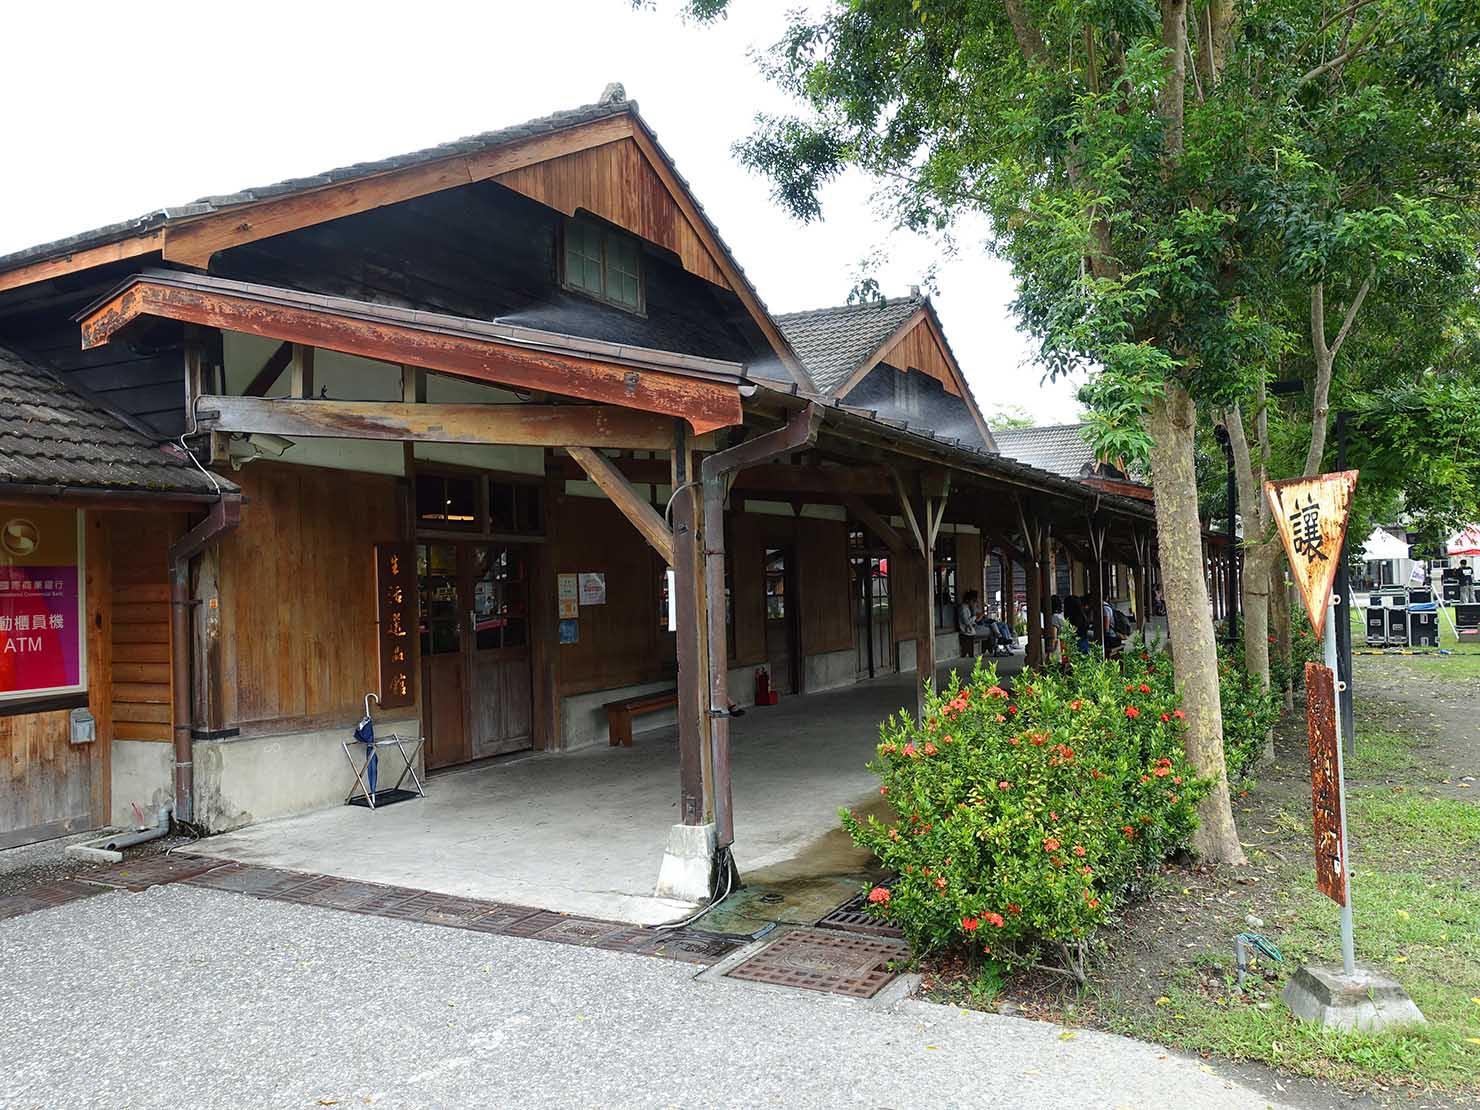 花蓮市街の有名観光スポット「a-zone花蓮文化創意產業園區」の木造建築